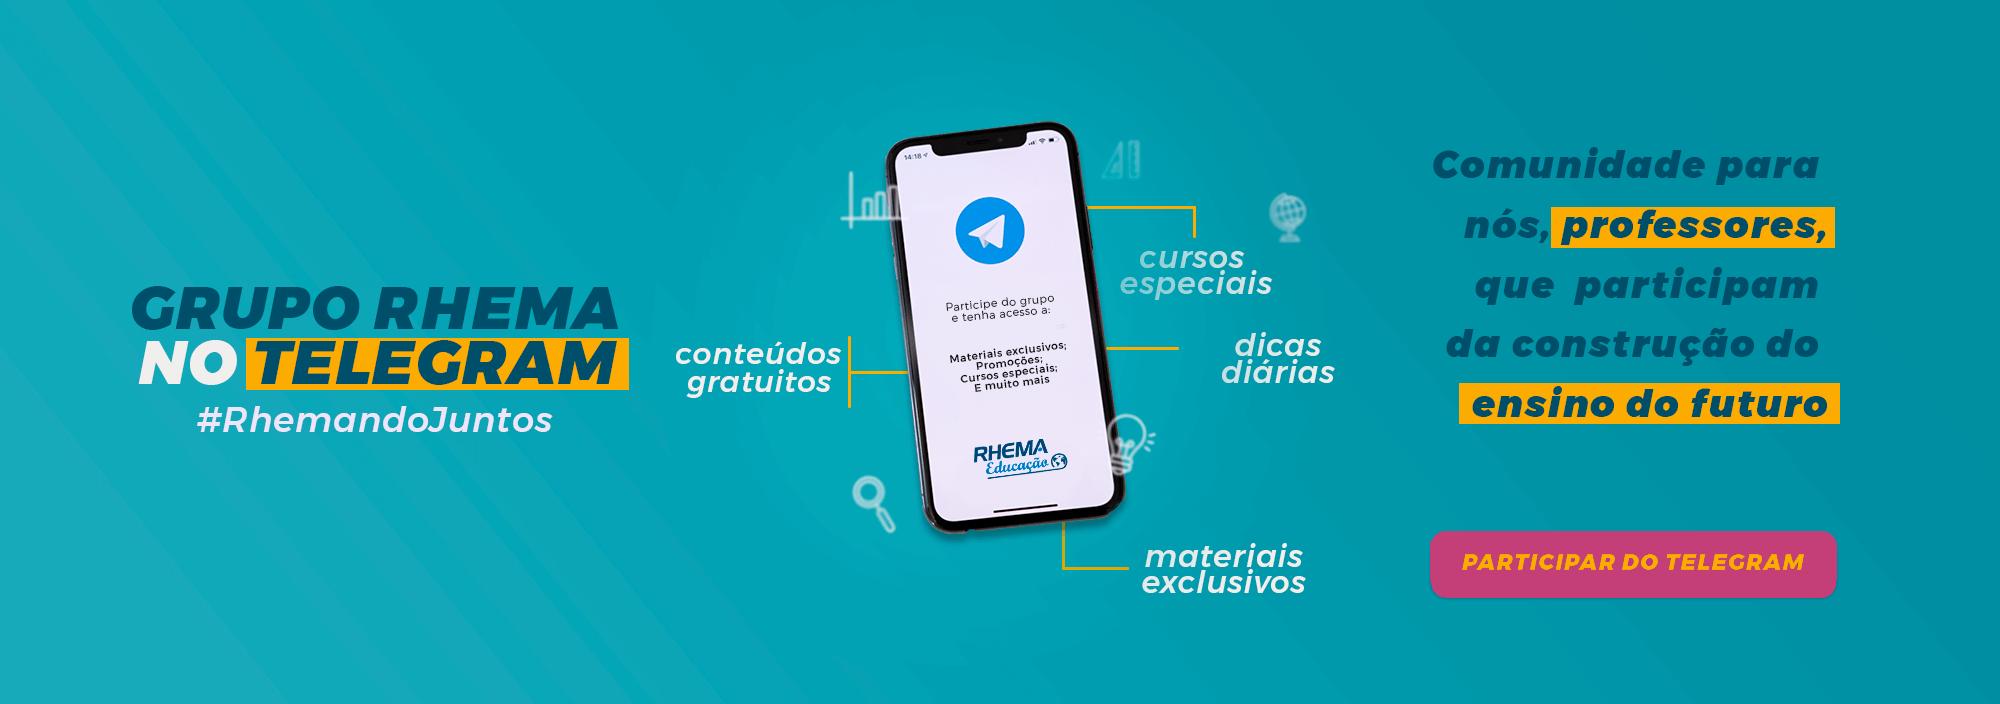 Grupo Rhema No Telegram